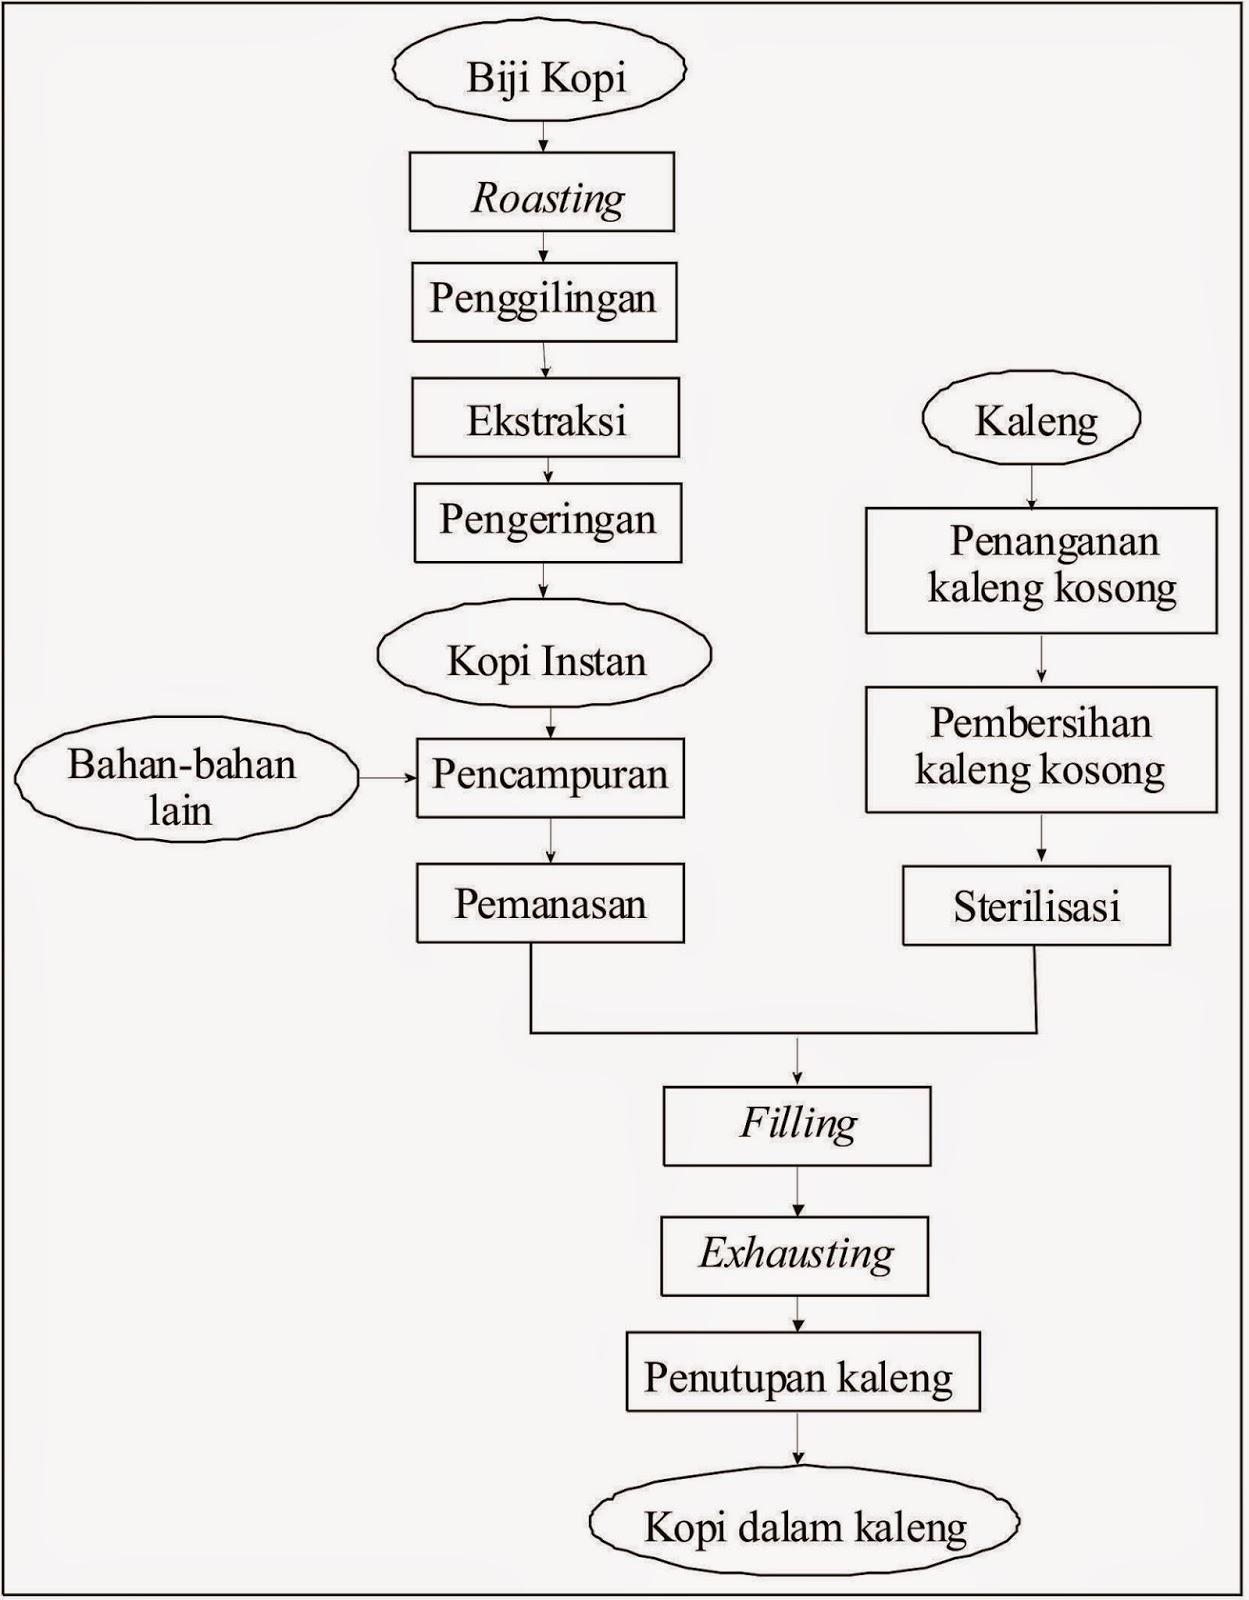 Deeuwi kemasan kaleng proses pengalengan exp nescaffe diagram alir pembuatan minuman kopi dalam kaleng ccuart Gallery